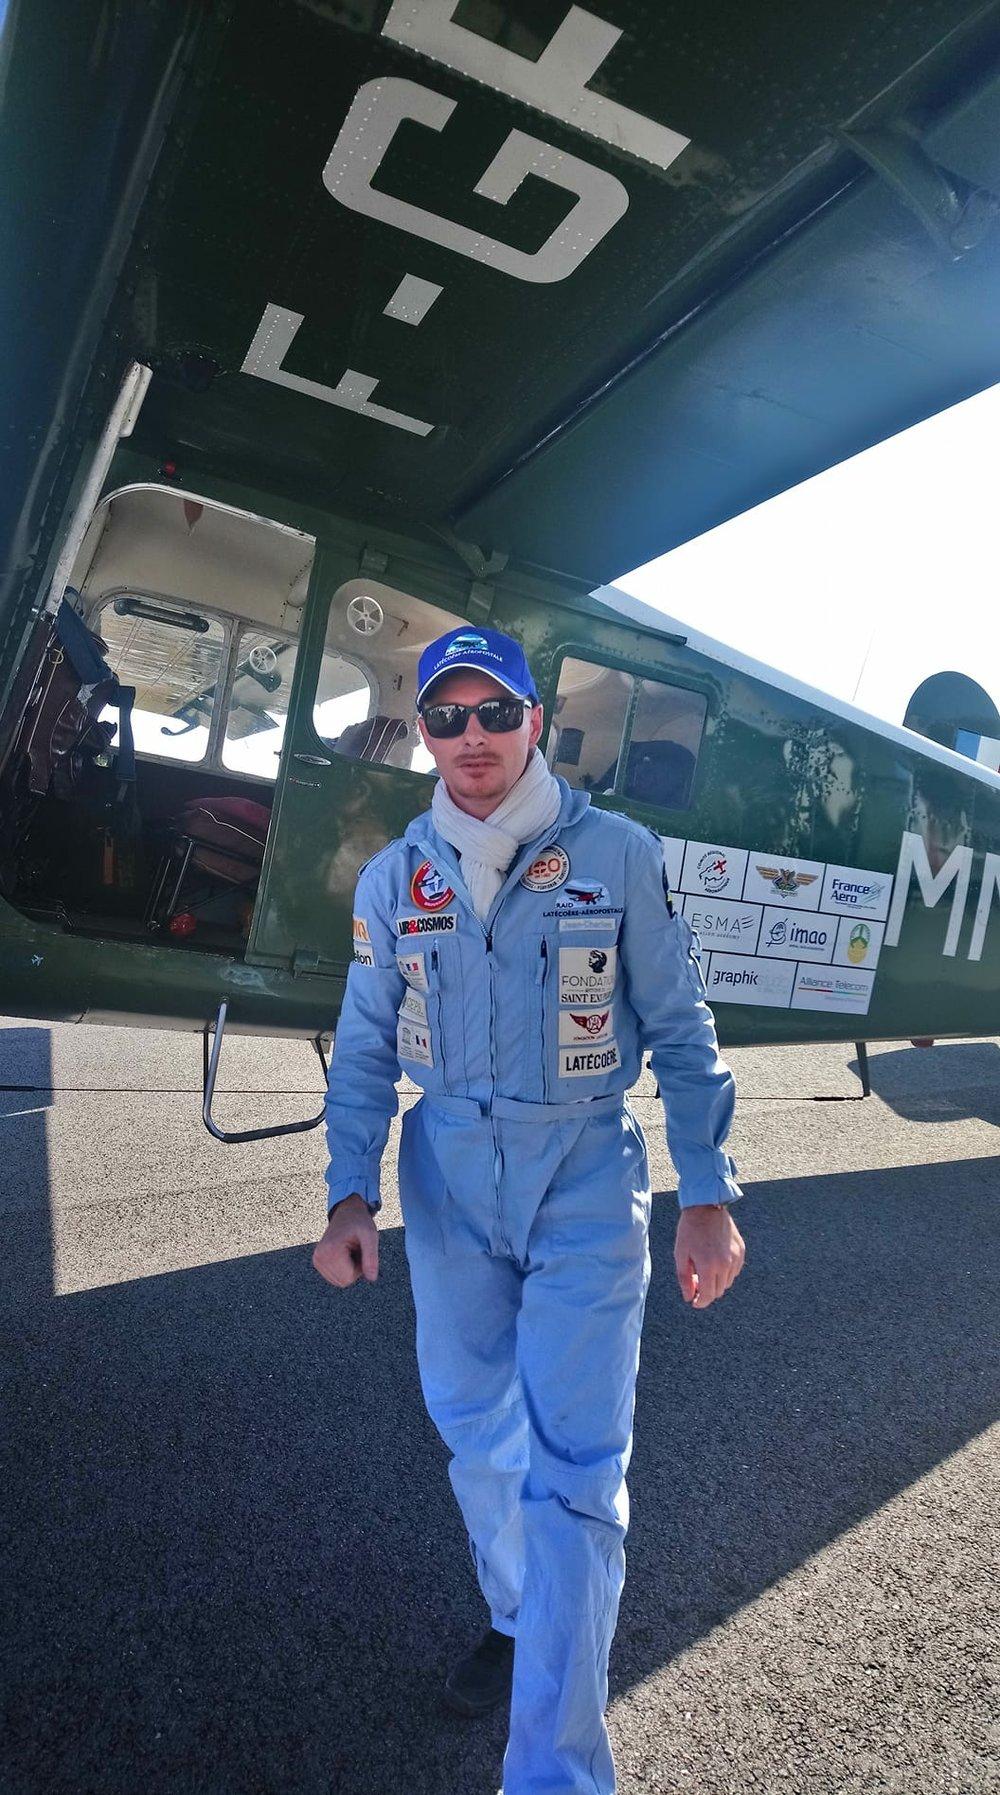 Jean-Charles Saquet - IMAO Chief Pilot